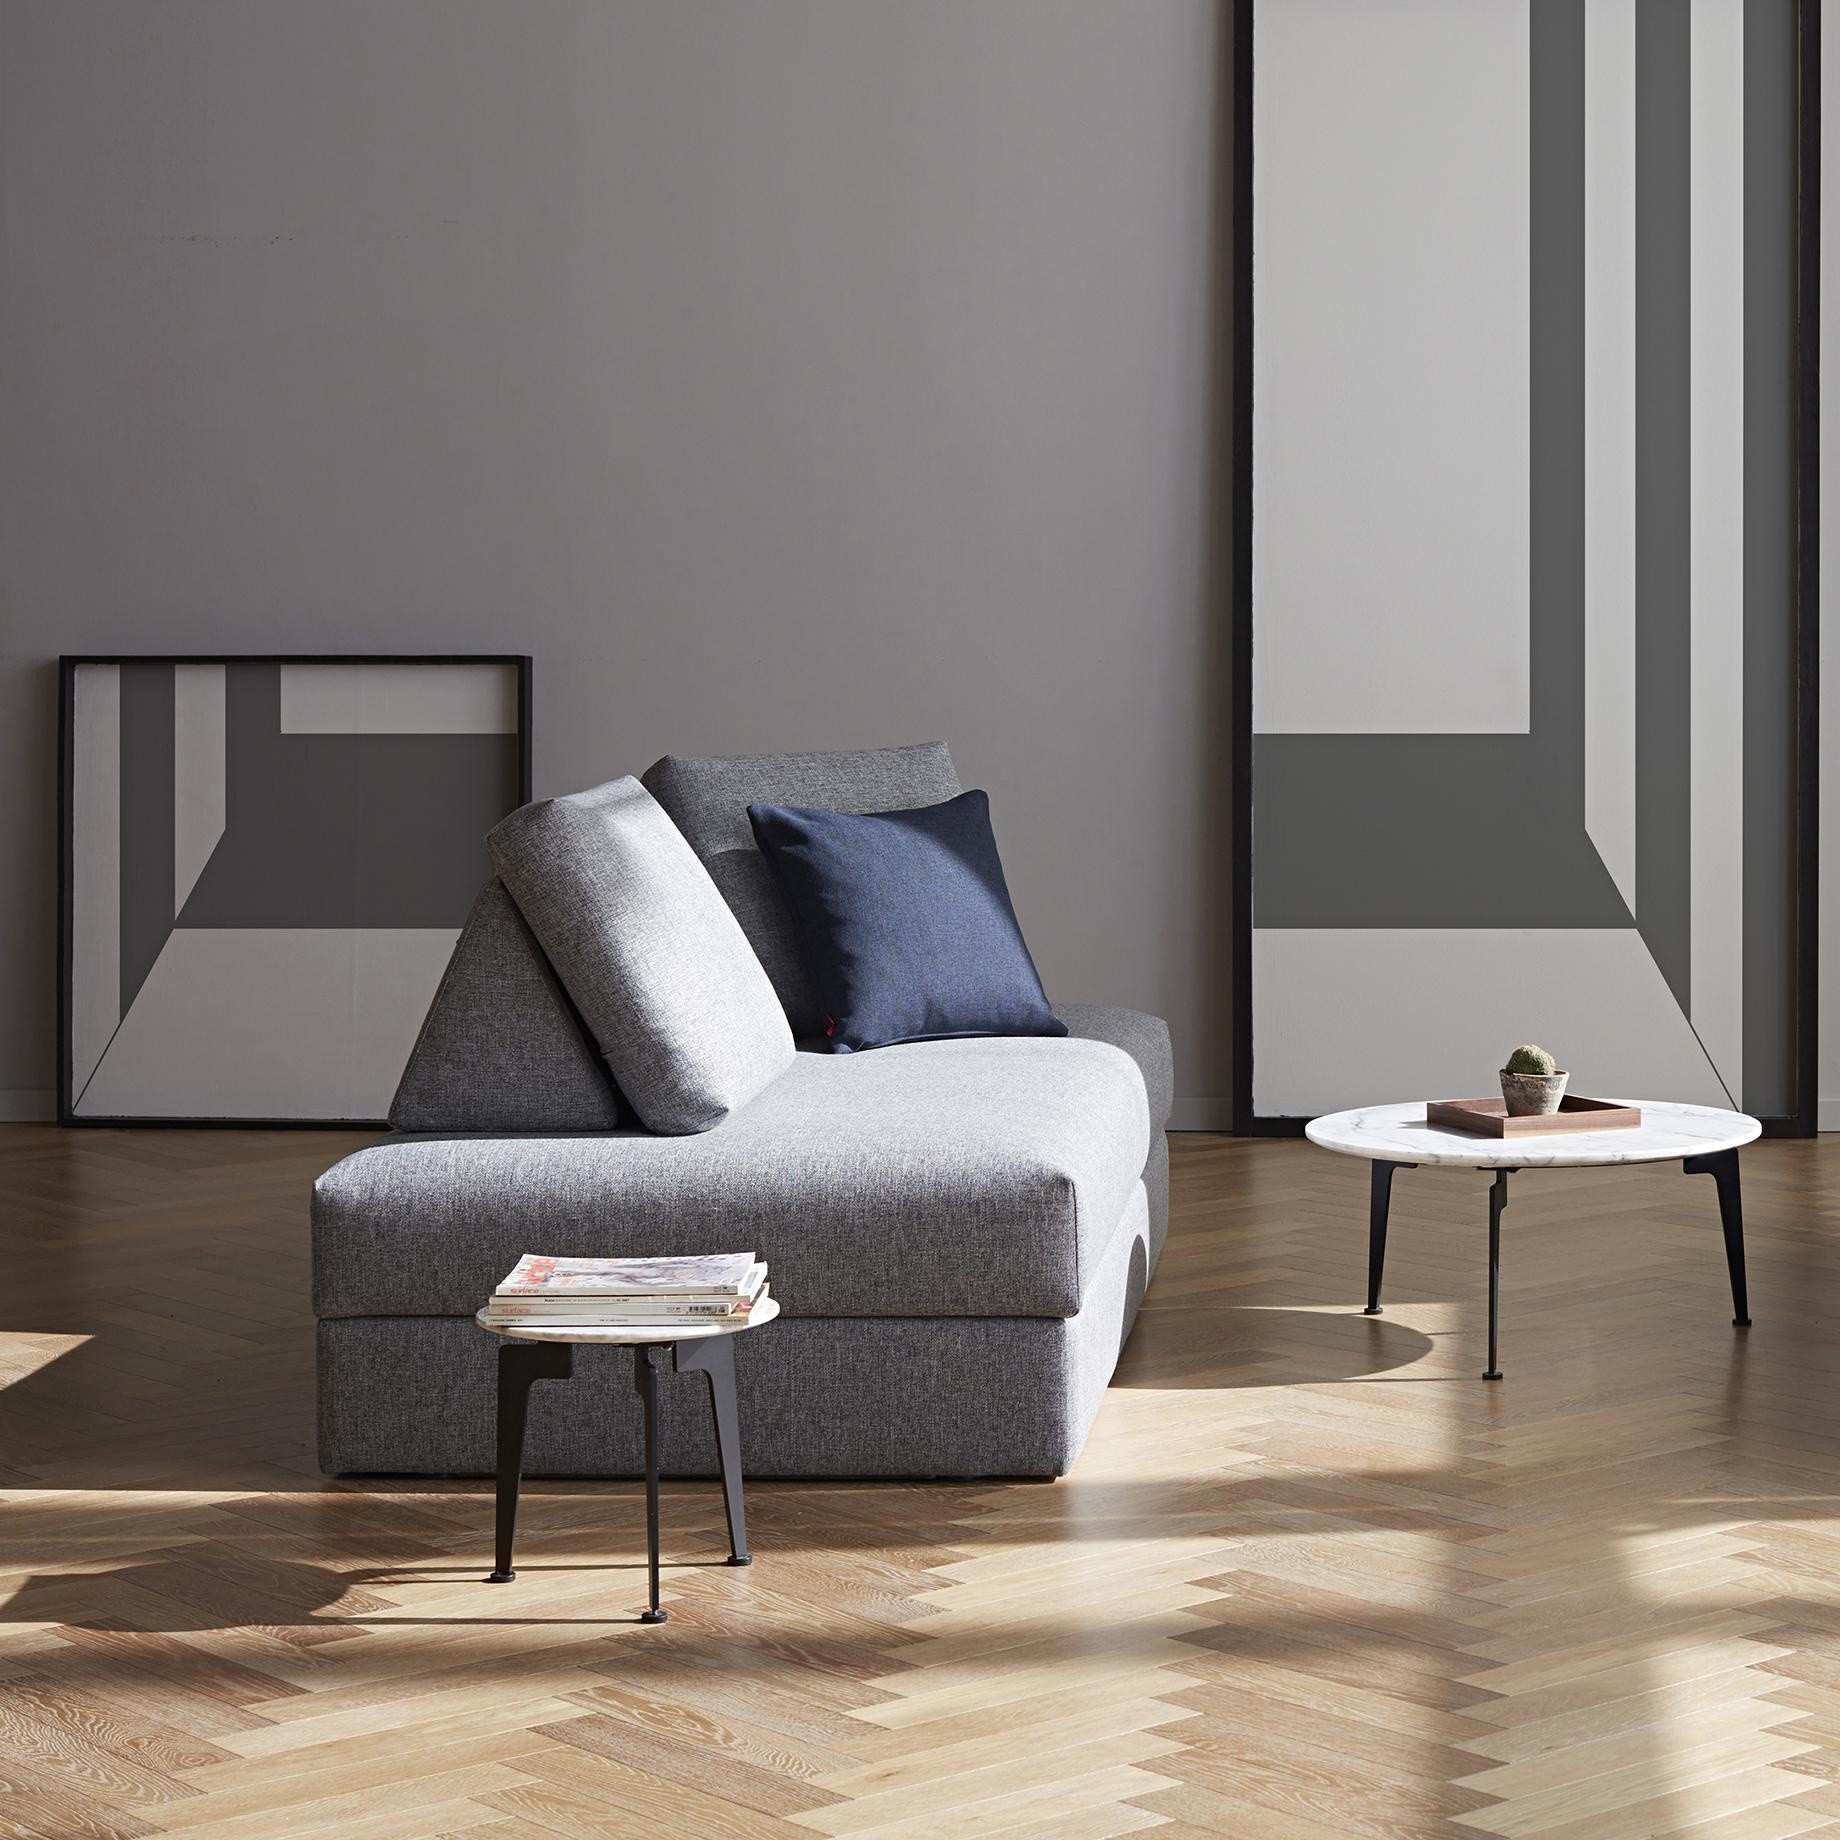 innovation all you need klappsofa mit bettkasten. Black Bedroom Furniture Sets. Home Design Ideas